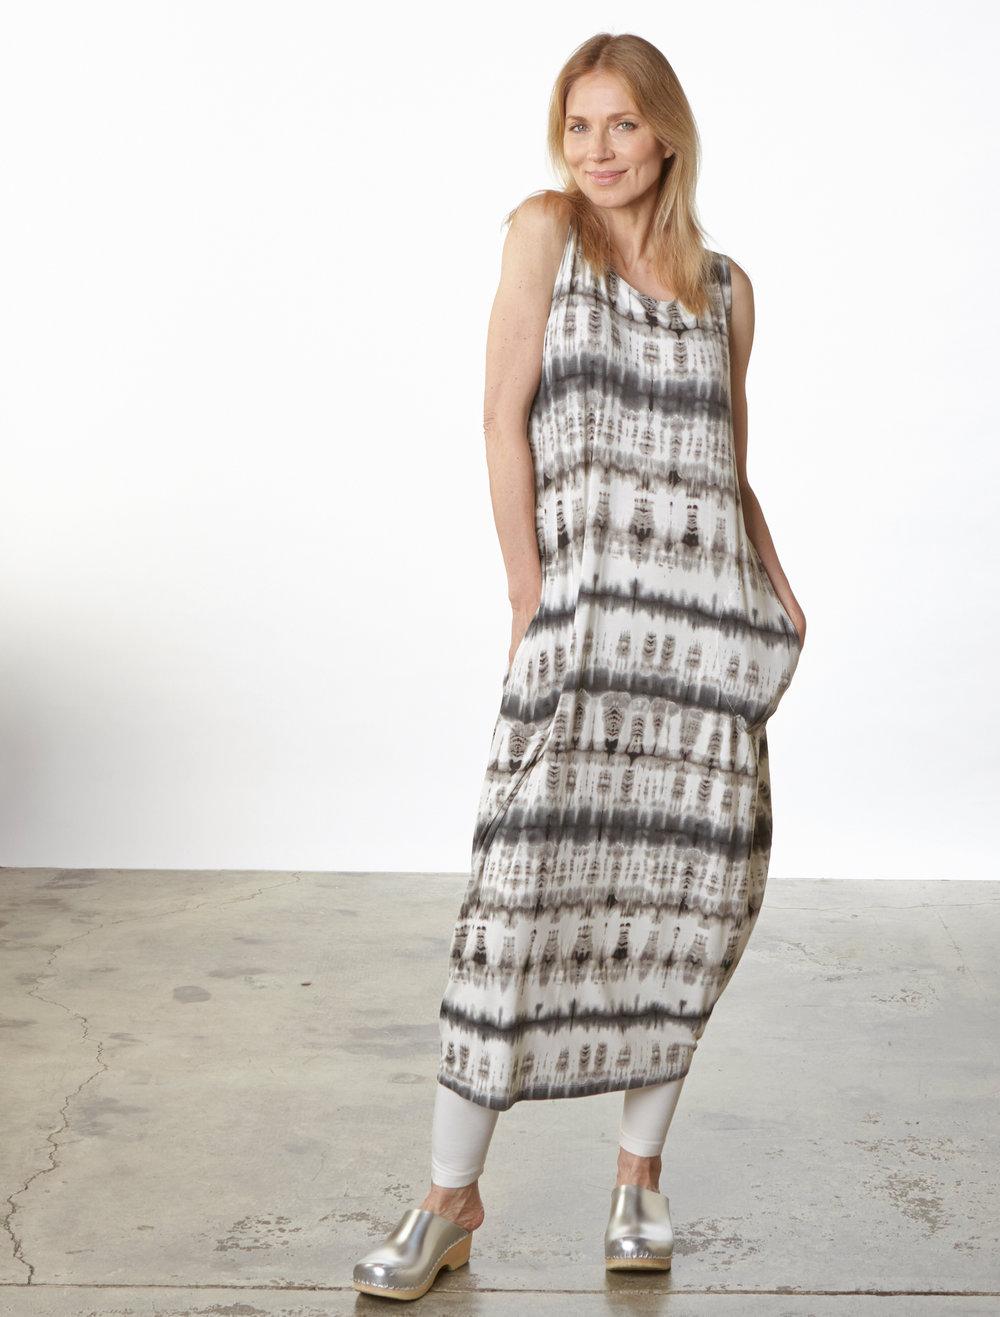 Pippa Dress in Cream Tie Dye Viscose Jersey, Basic Legging in Cream Bamboo Cotton